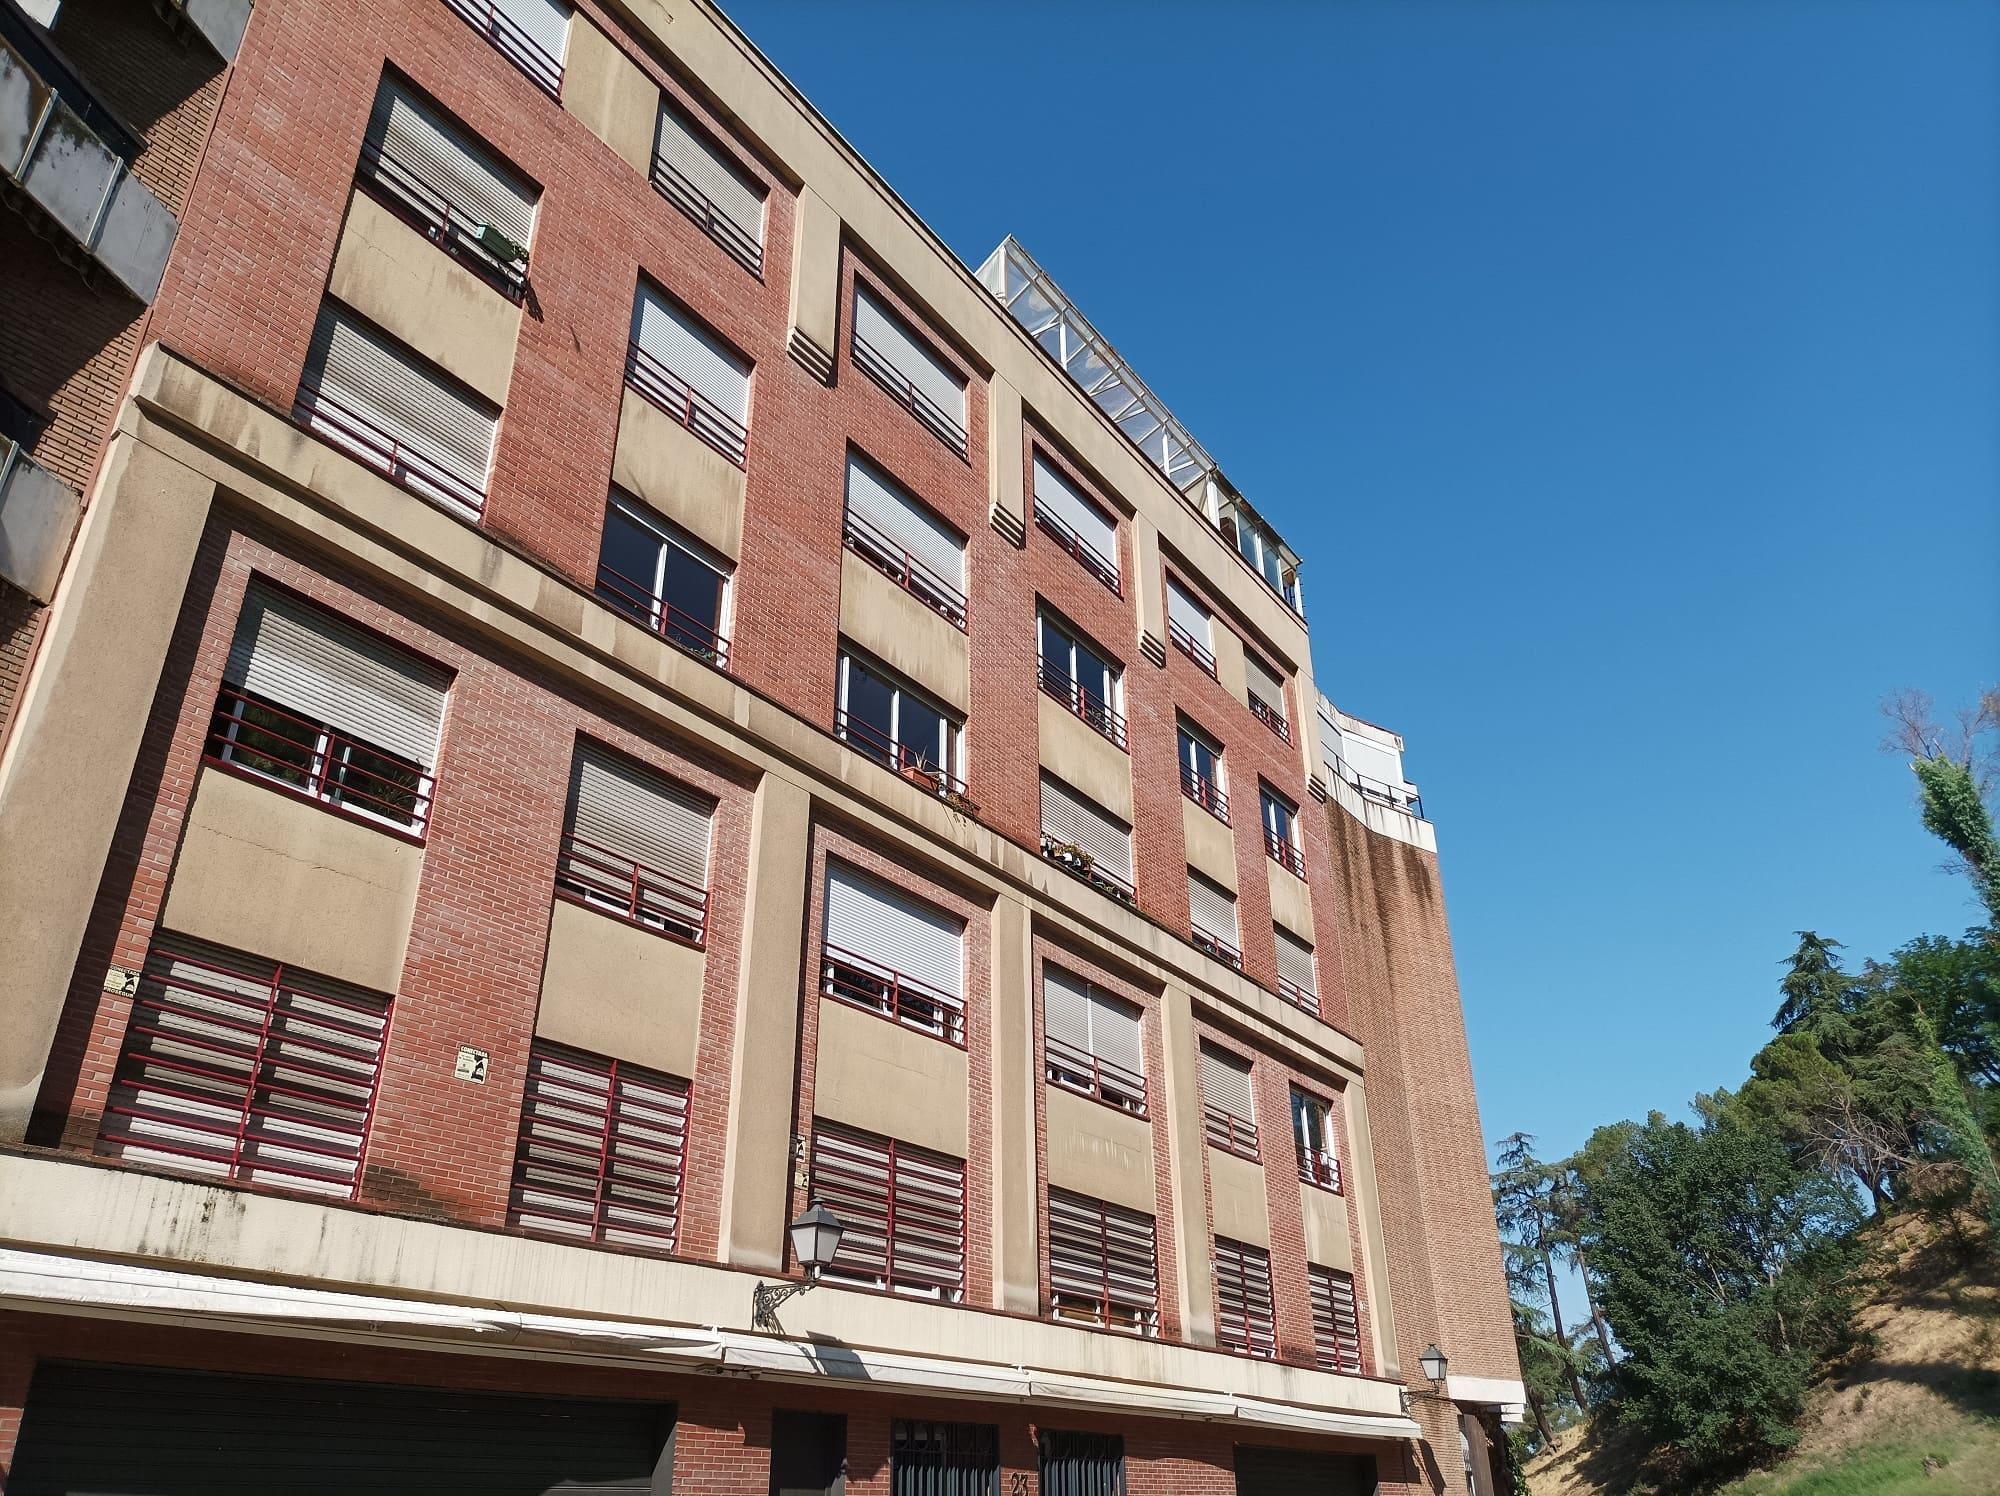 Alquiler de pisos en la calle Irún Madrid